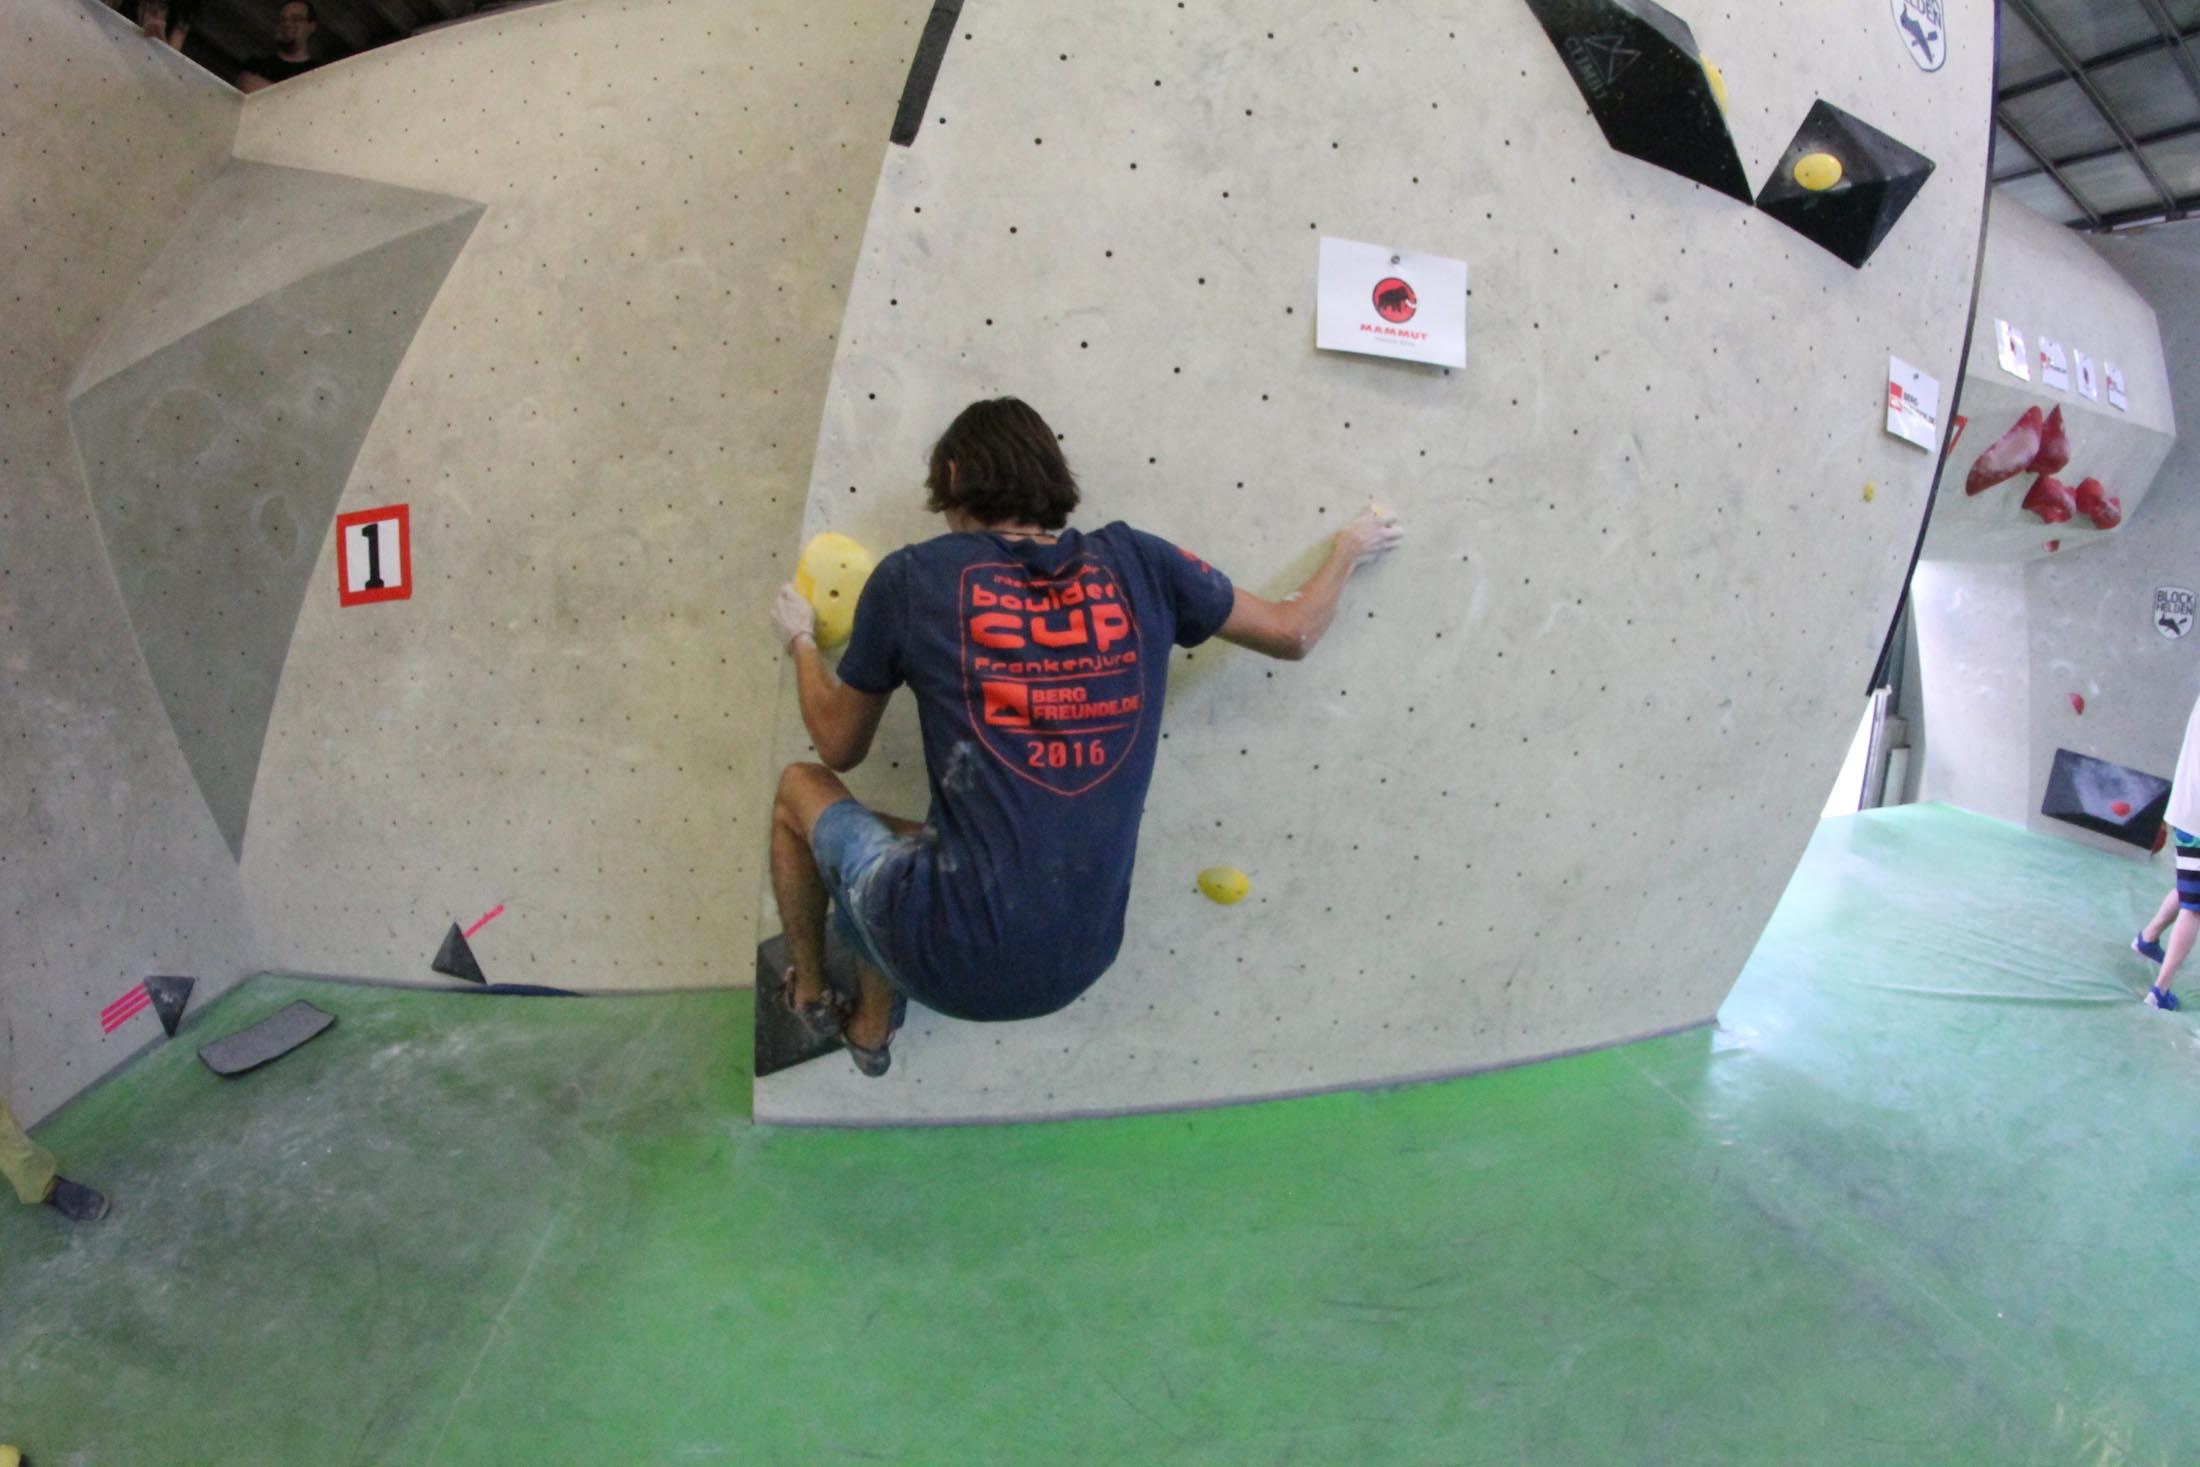 Finale, internationaler bouldercup Frankenjura 2016, BLOCKHELDEN Erlangen, Mammut, Bergfreunde.de, Boulderwettkampf07092016556